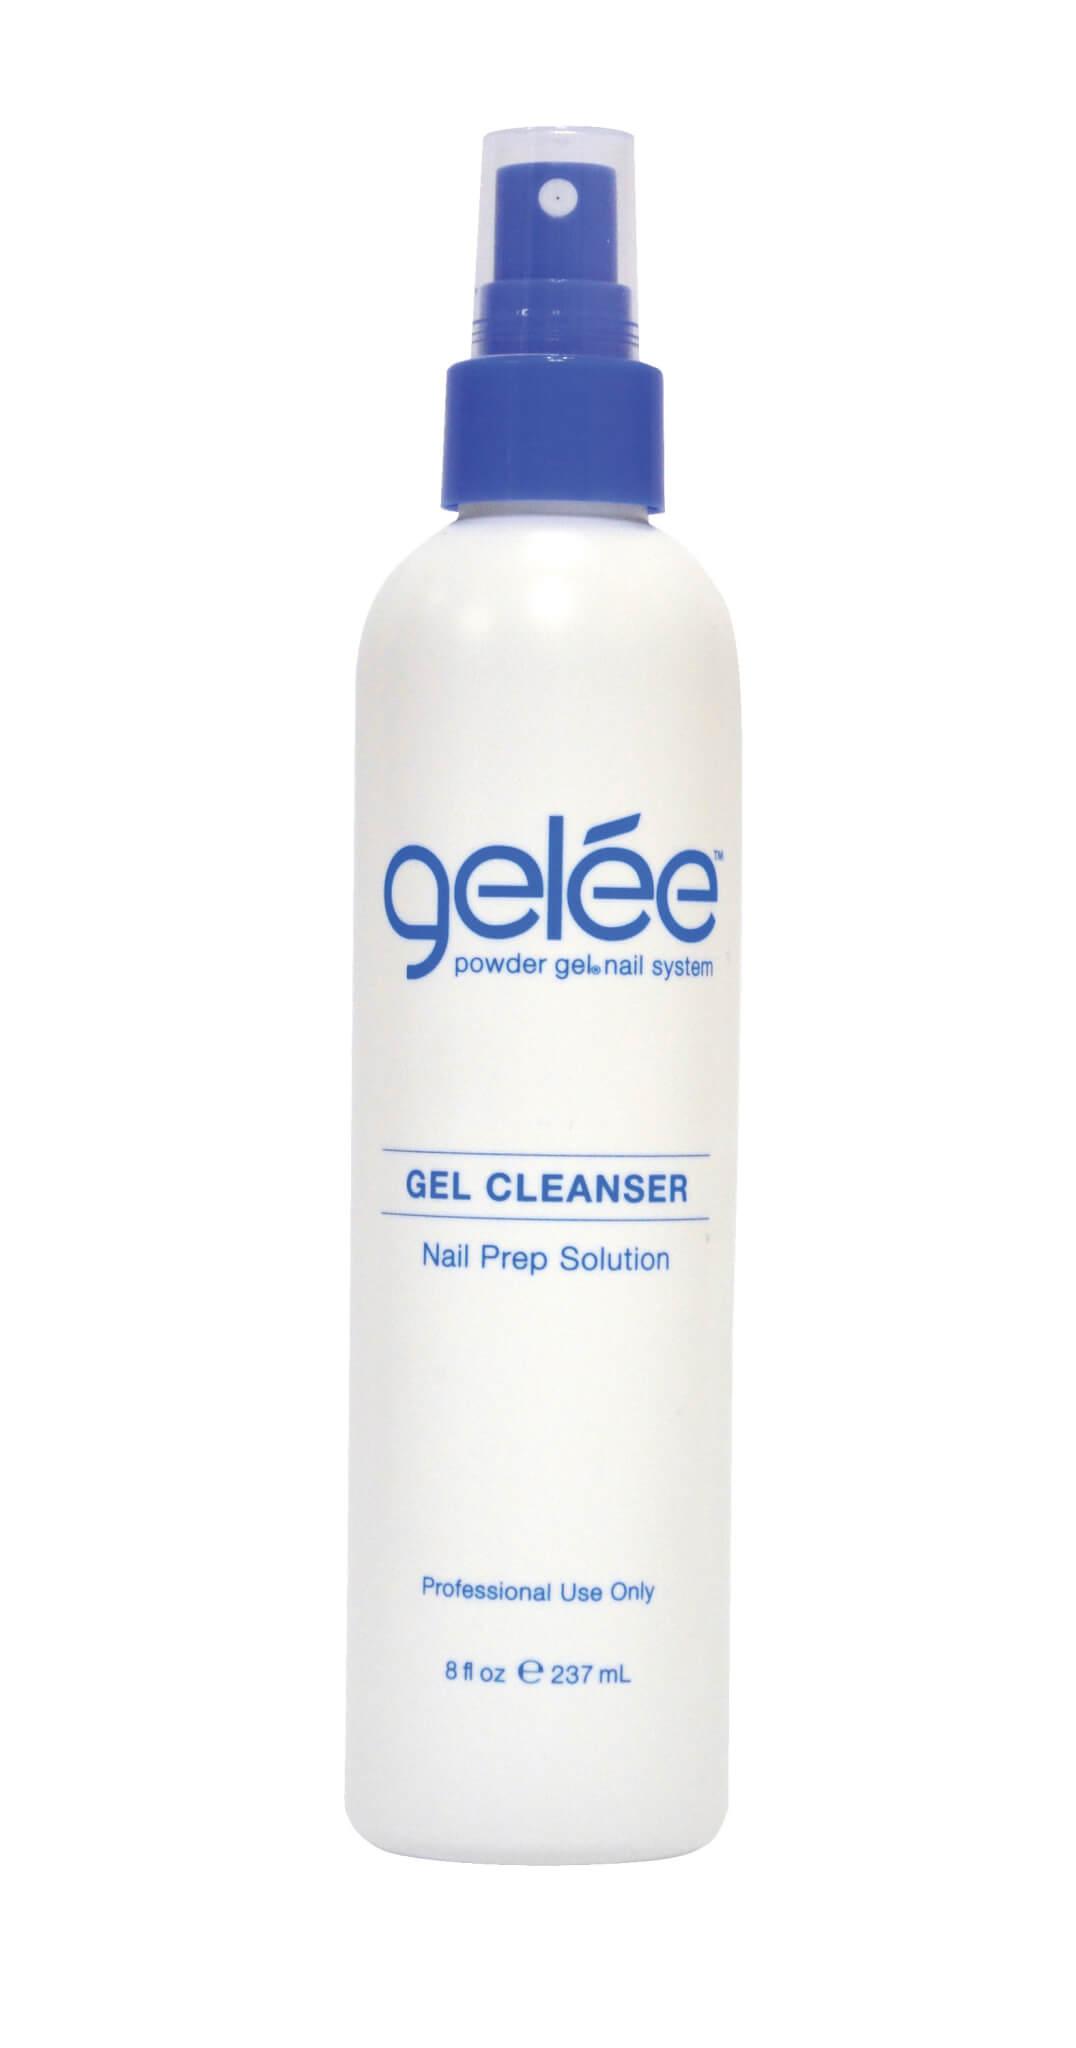 gelée gel cleanser product bottle.